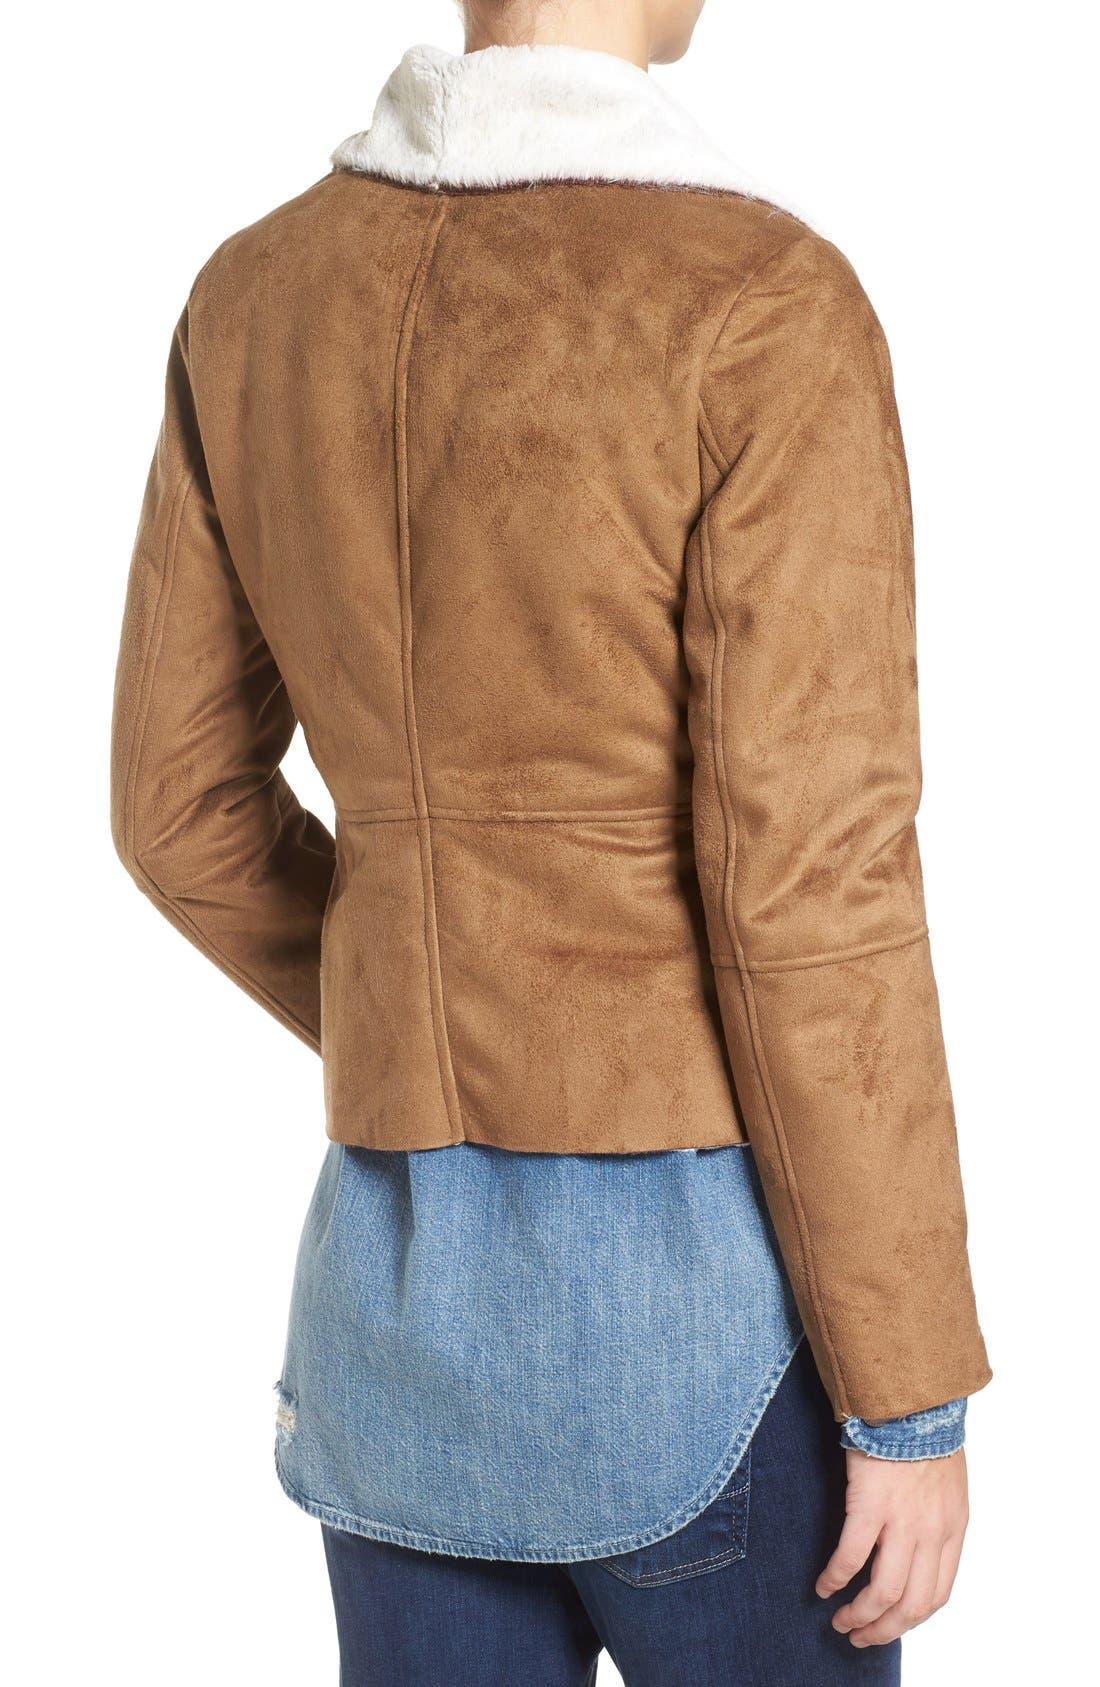 Bourne Faux Shearling Jacket,                             Alternate thumbnail 2, color,                             257